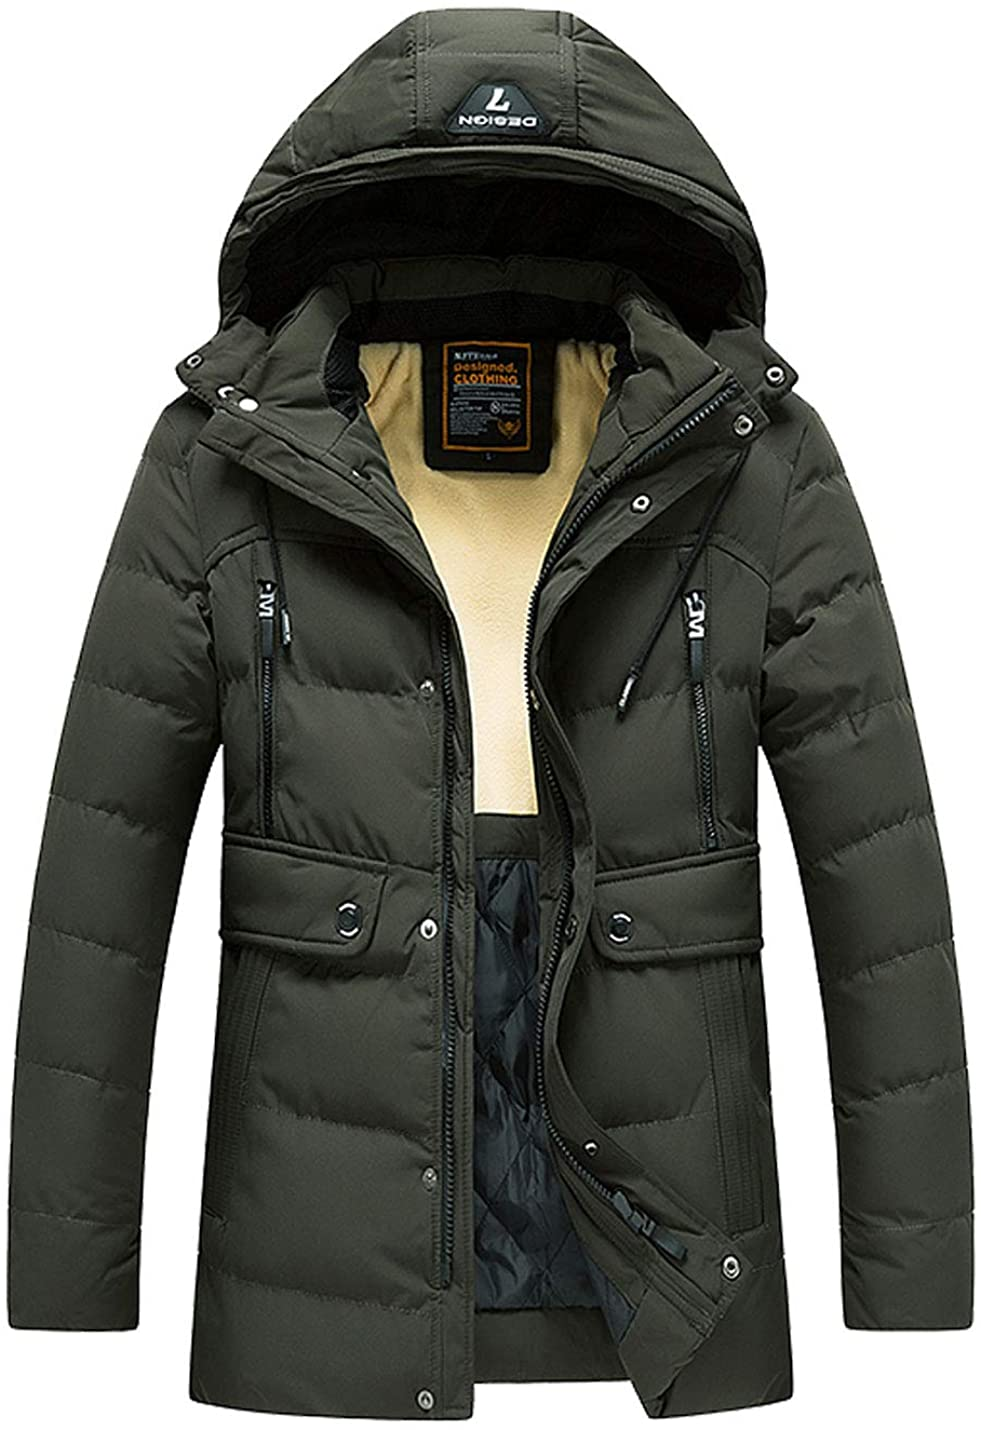 Flygo Men's Winter Warm Coat with Detachable Hood Parka Jacket